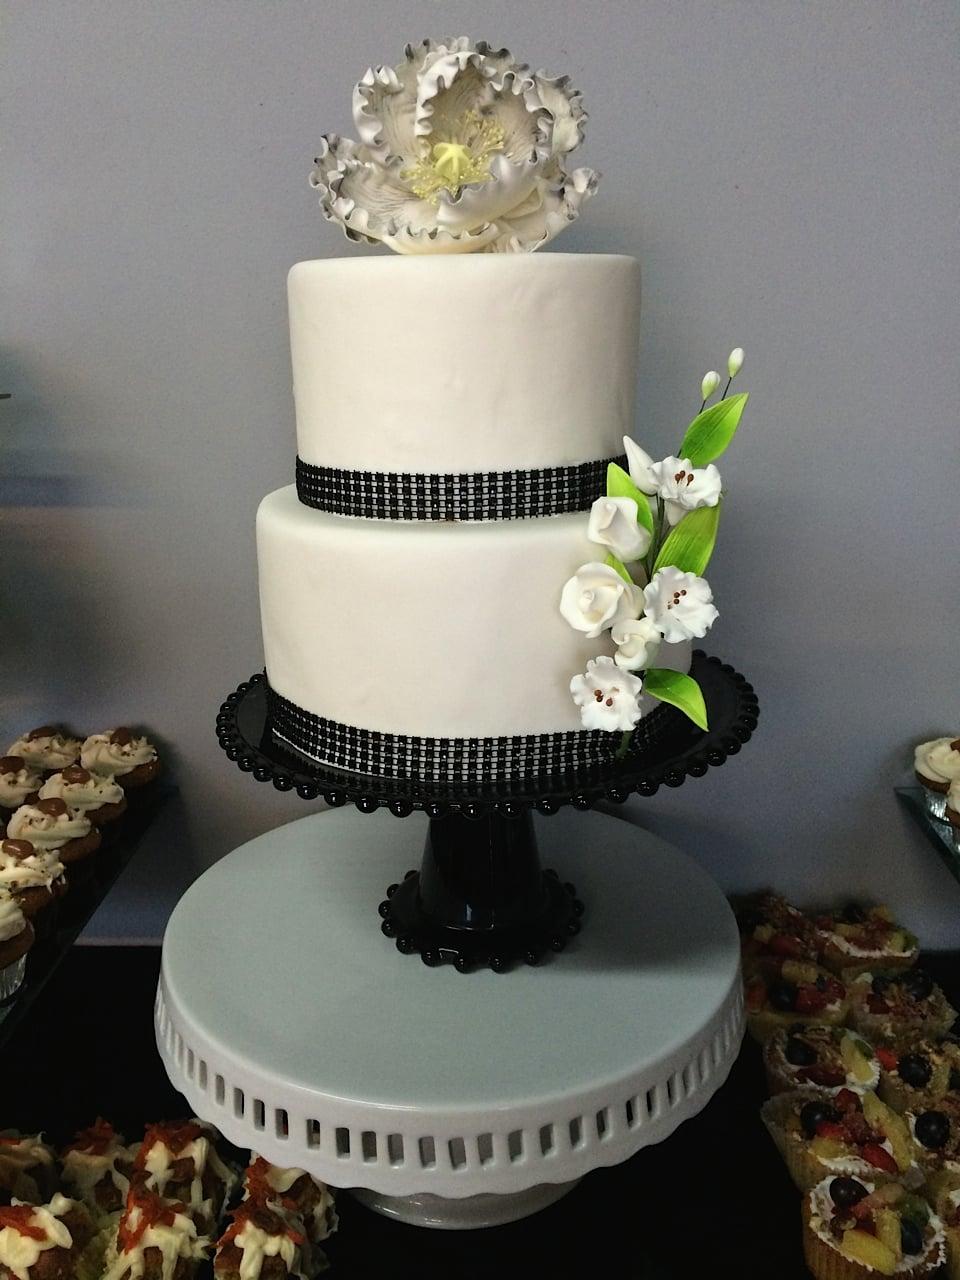 Simply Elegant White Fondant Cake